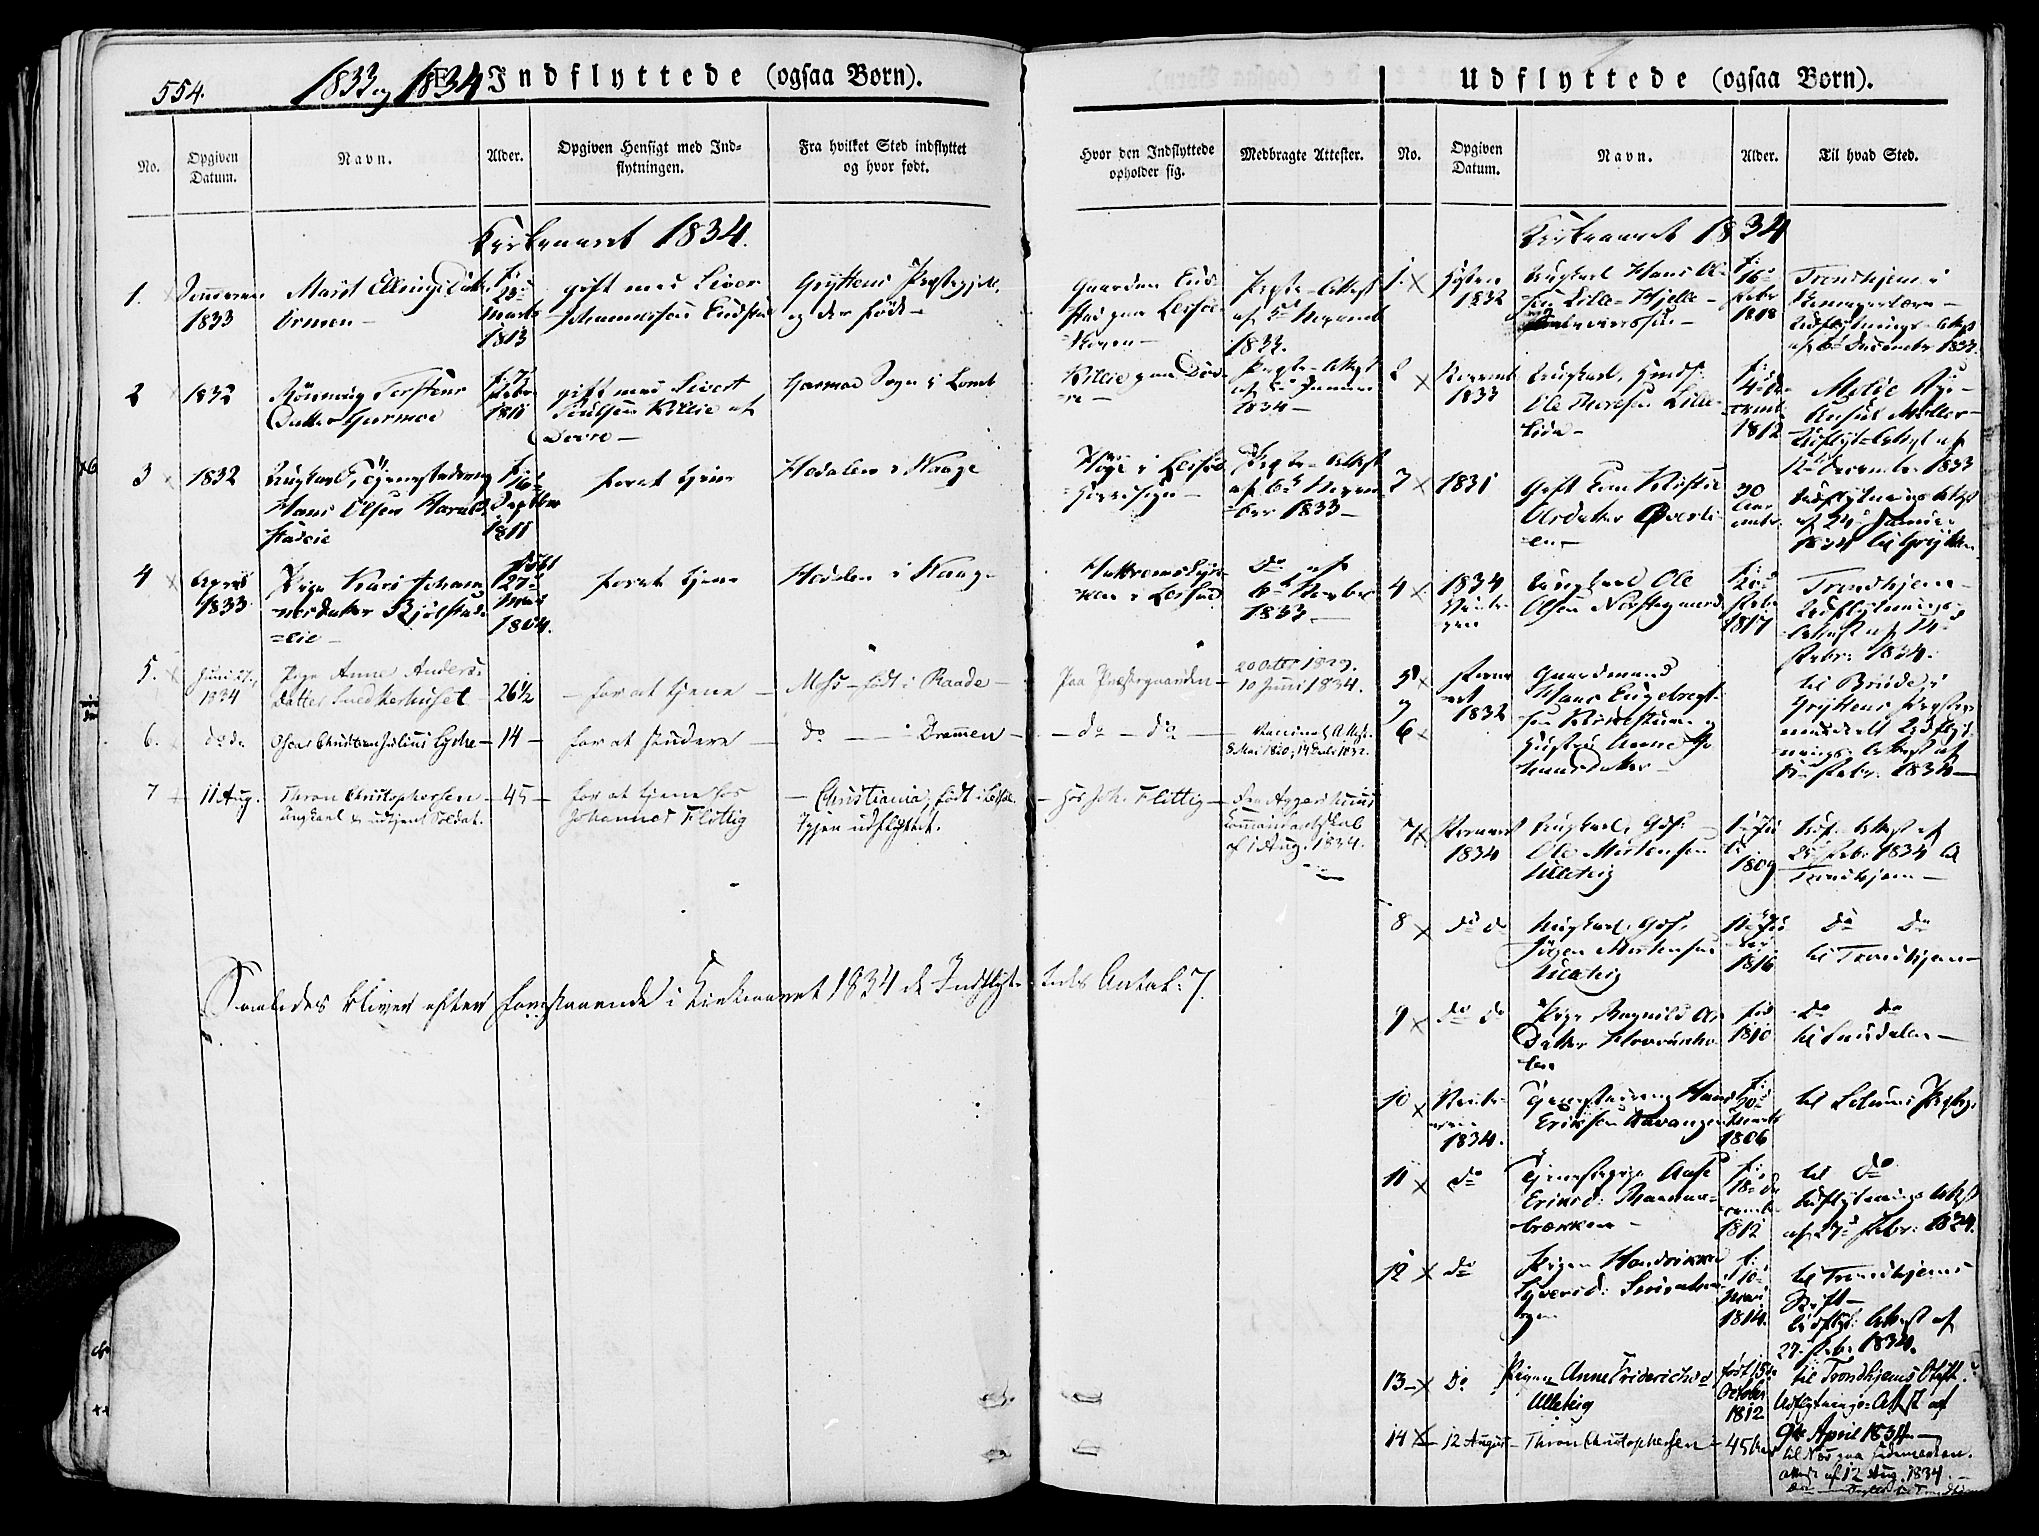 SAH, Lesja prestekontor, Ministerialbok nr. 5, 1830-1842, s. 554